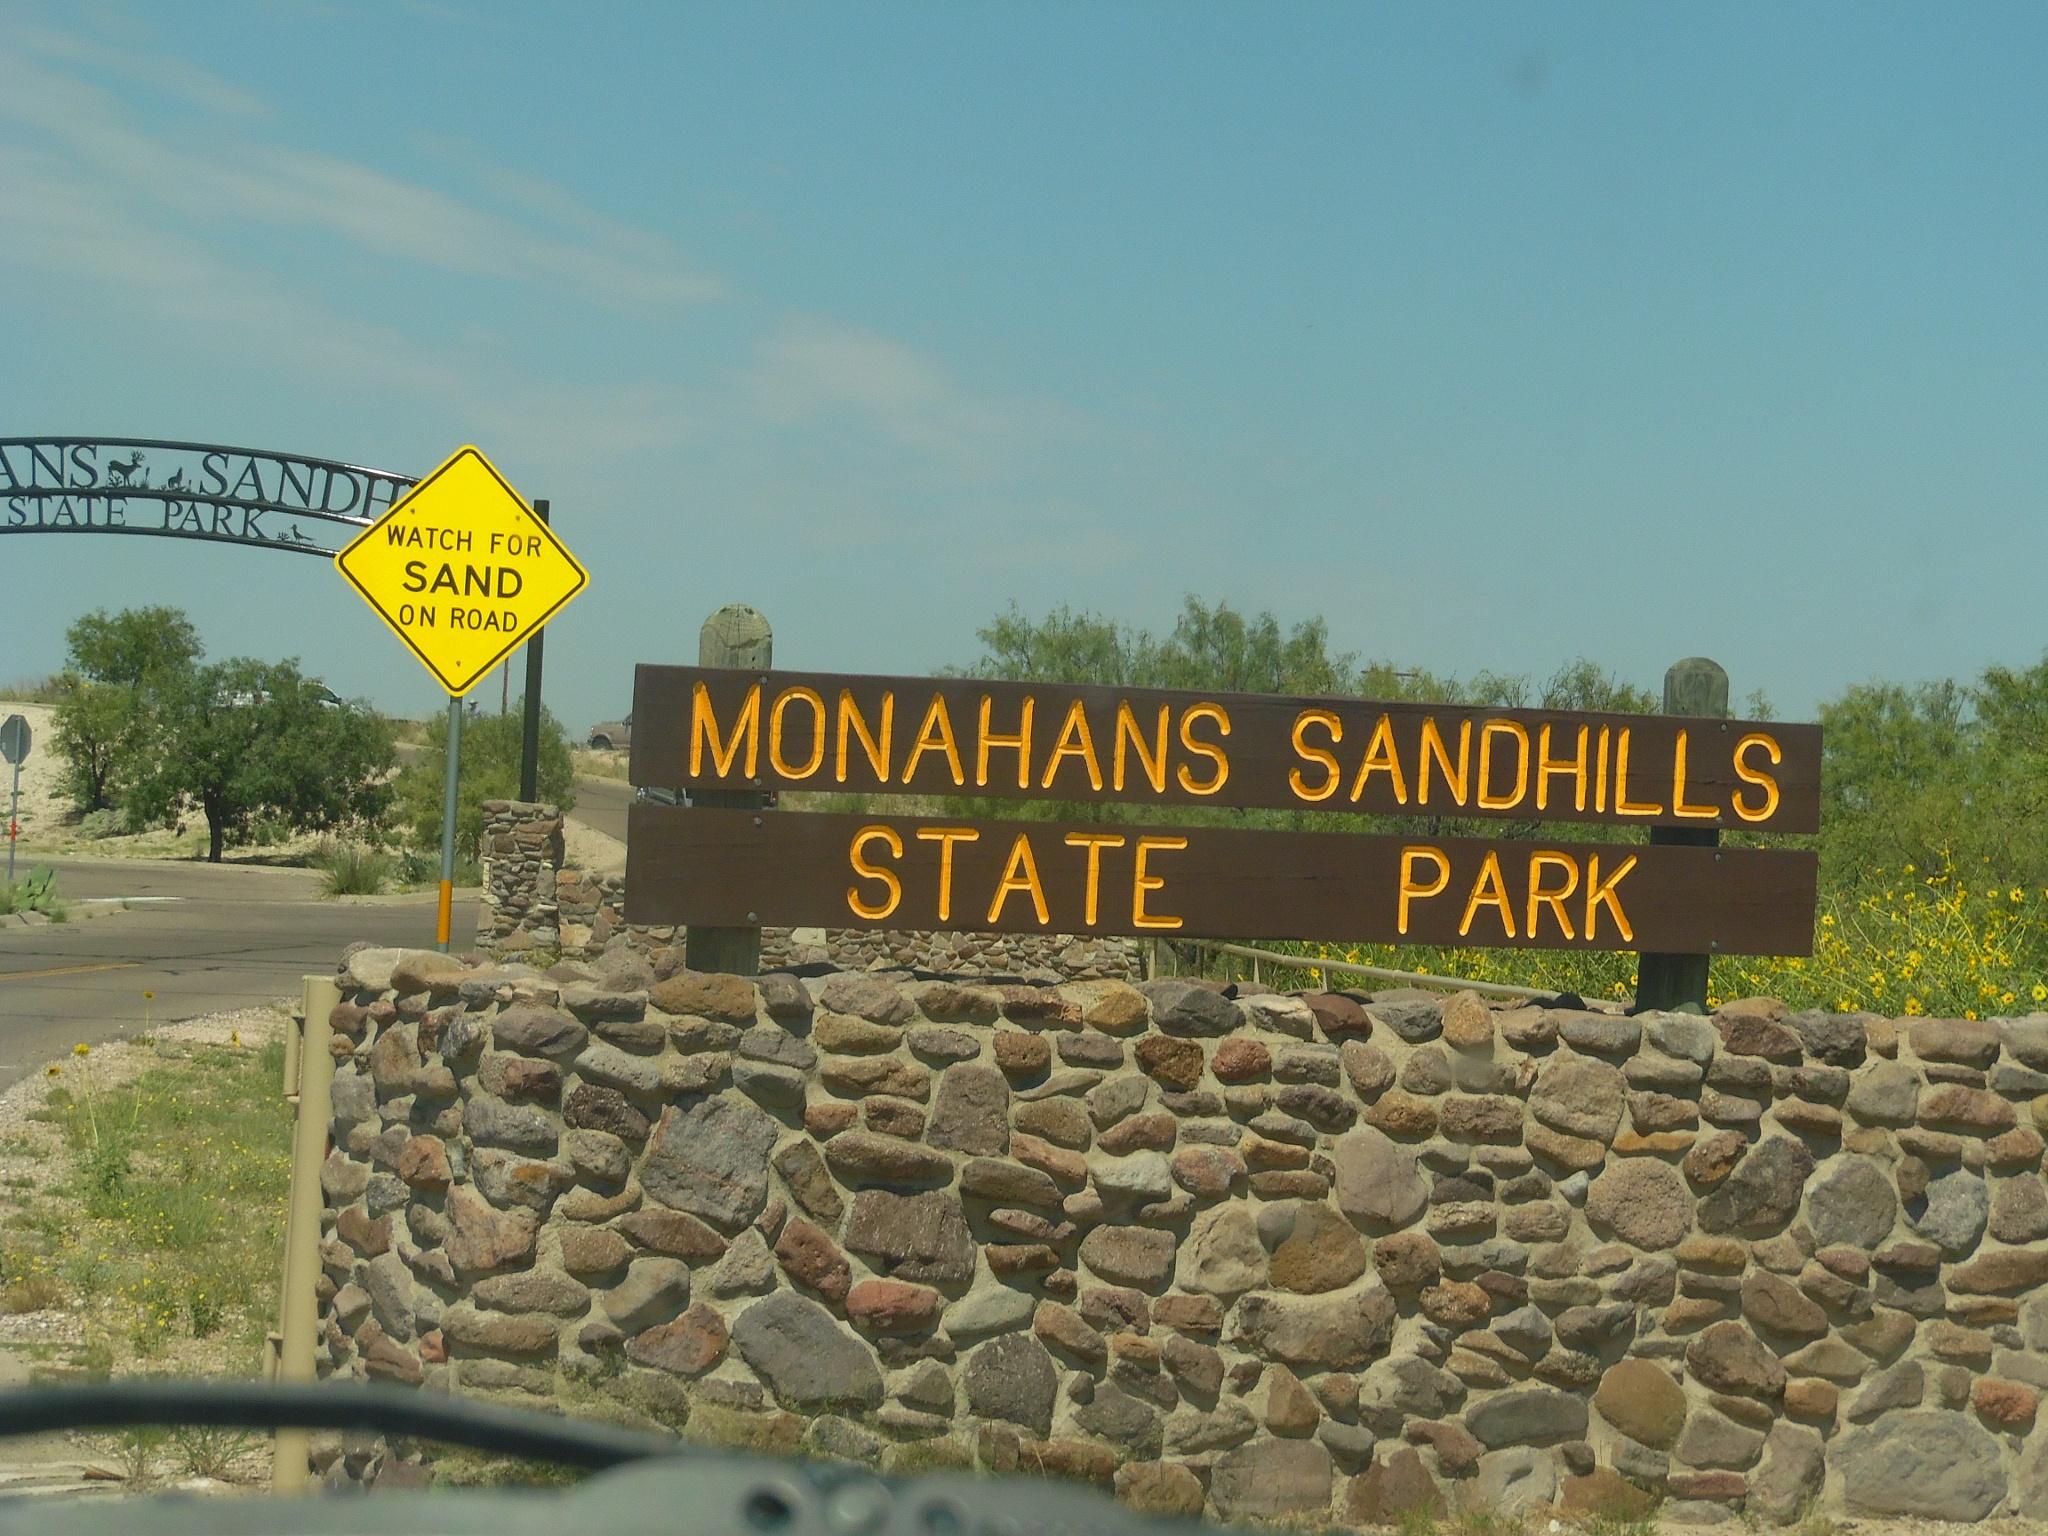 Monahans Sandhills State Park by john.fisher.7315